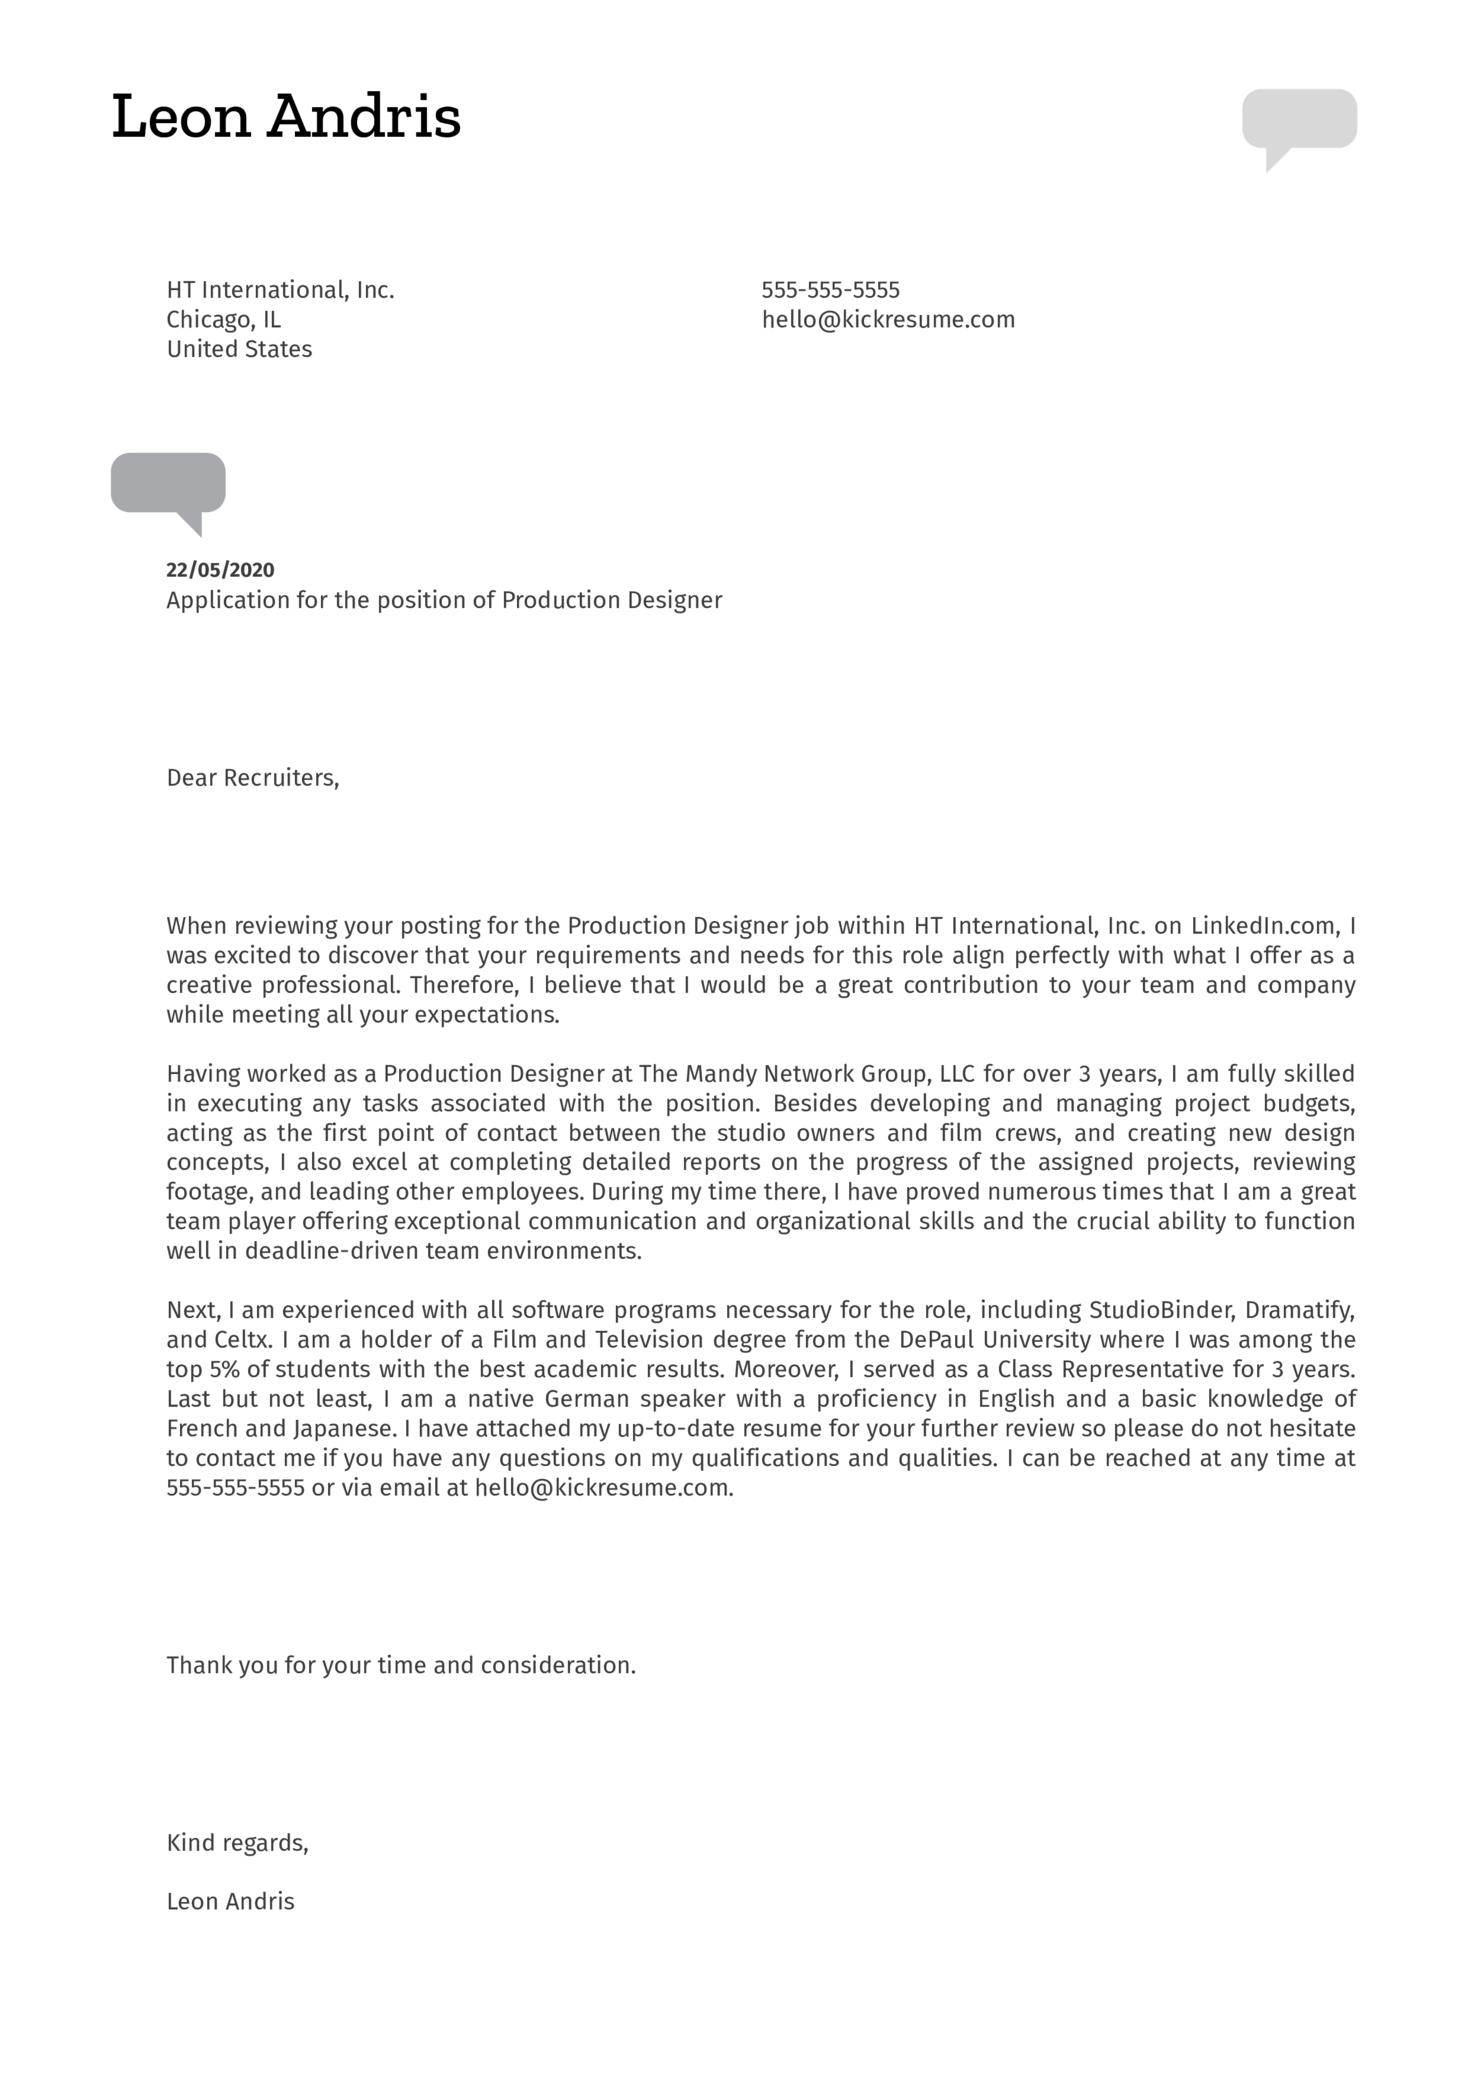 Production Designer Cover Letter Sample